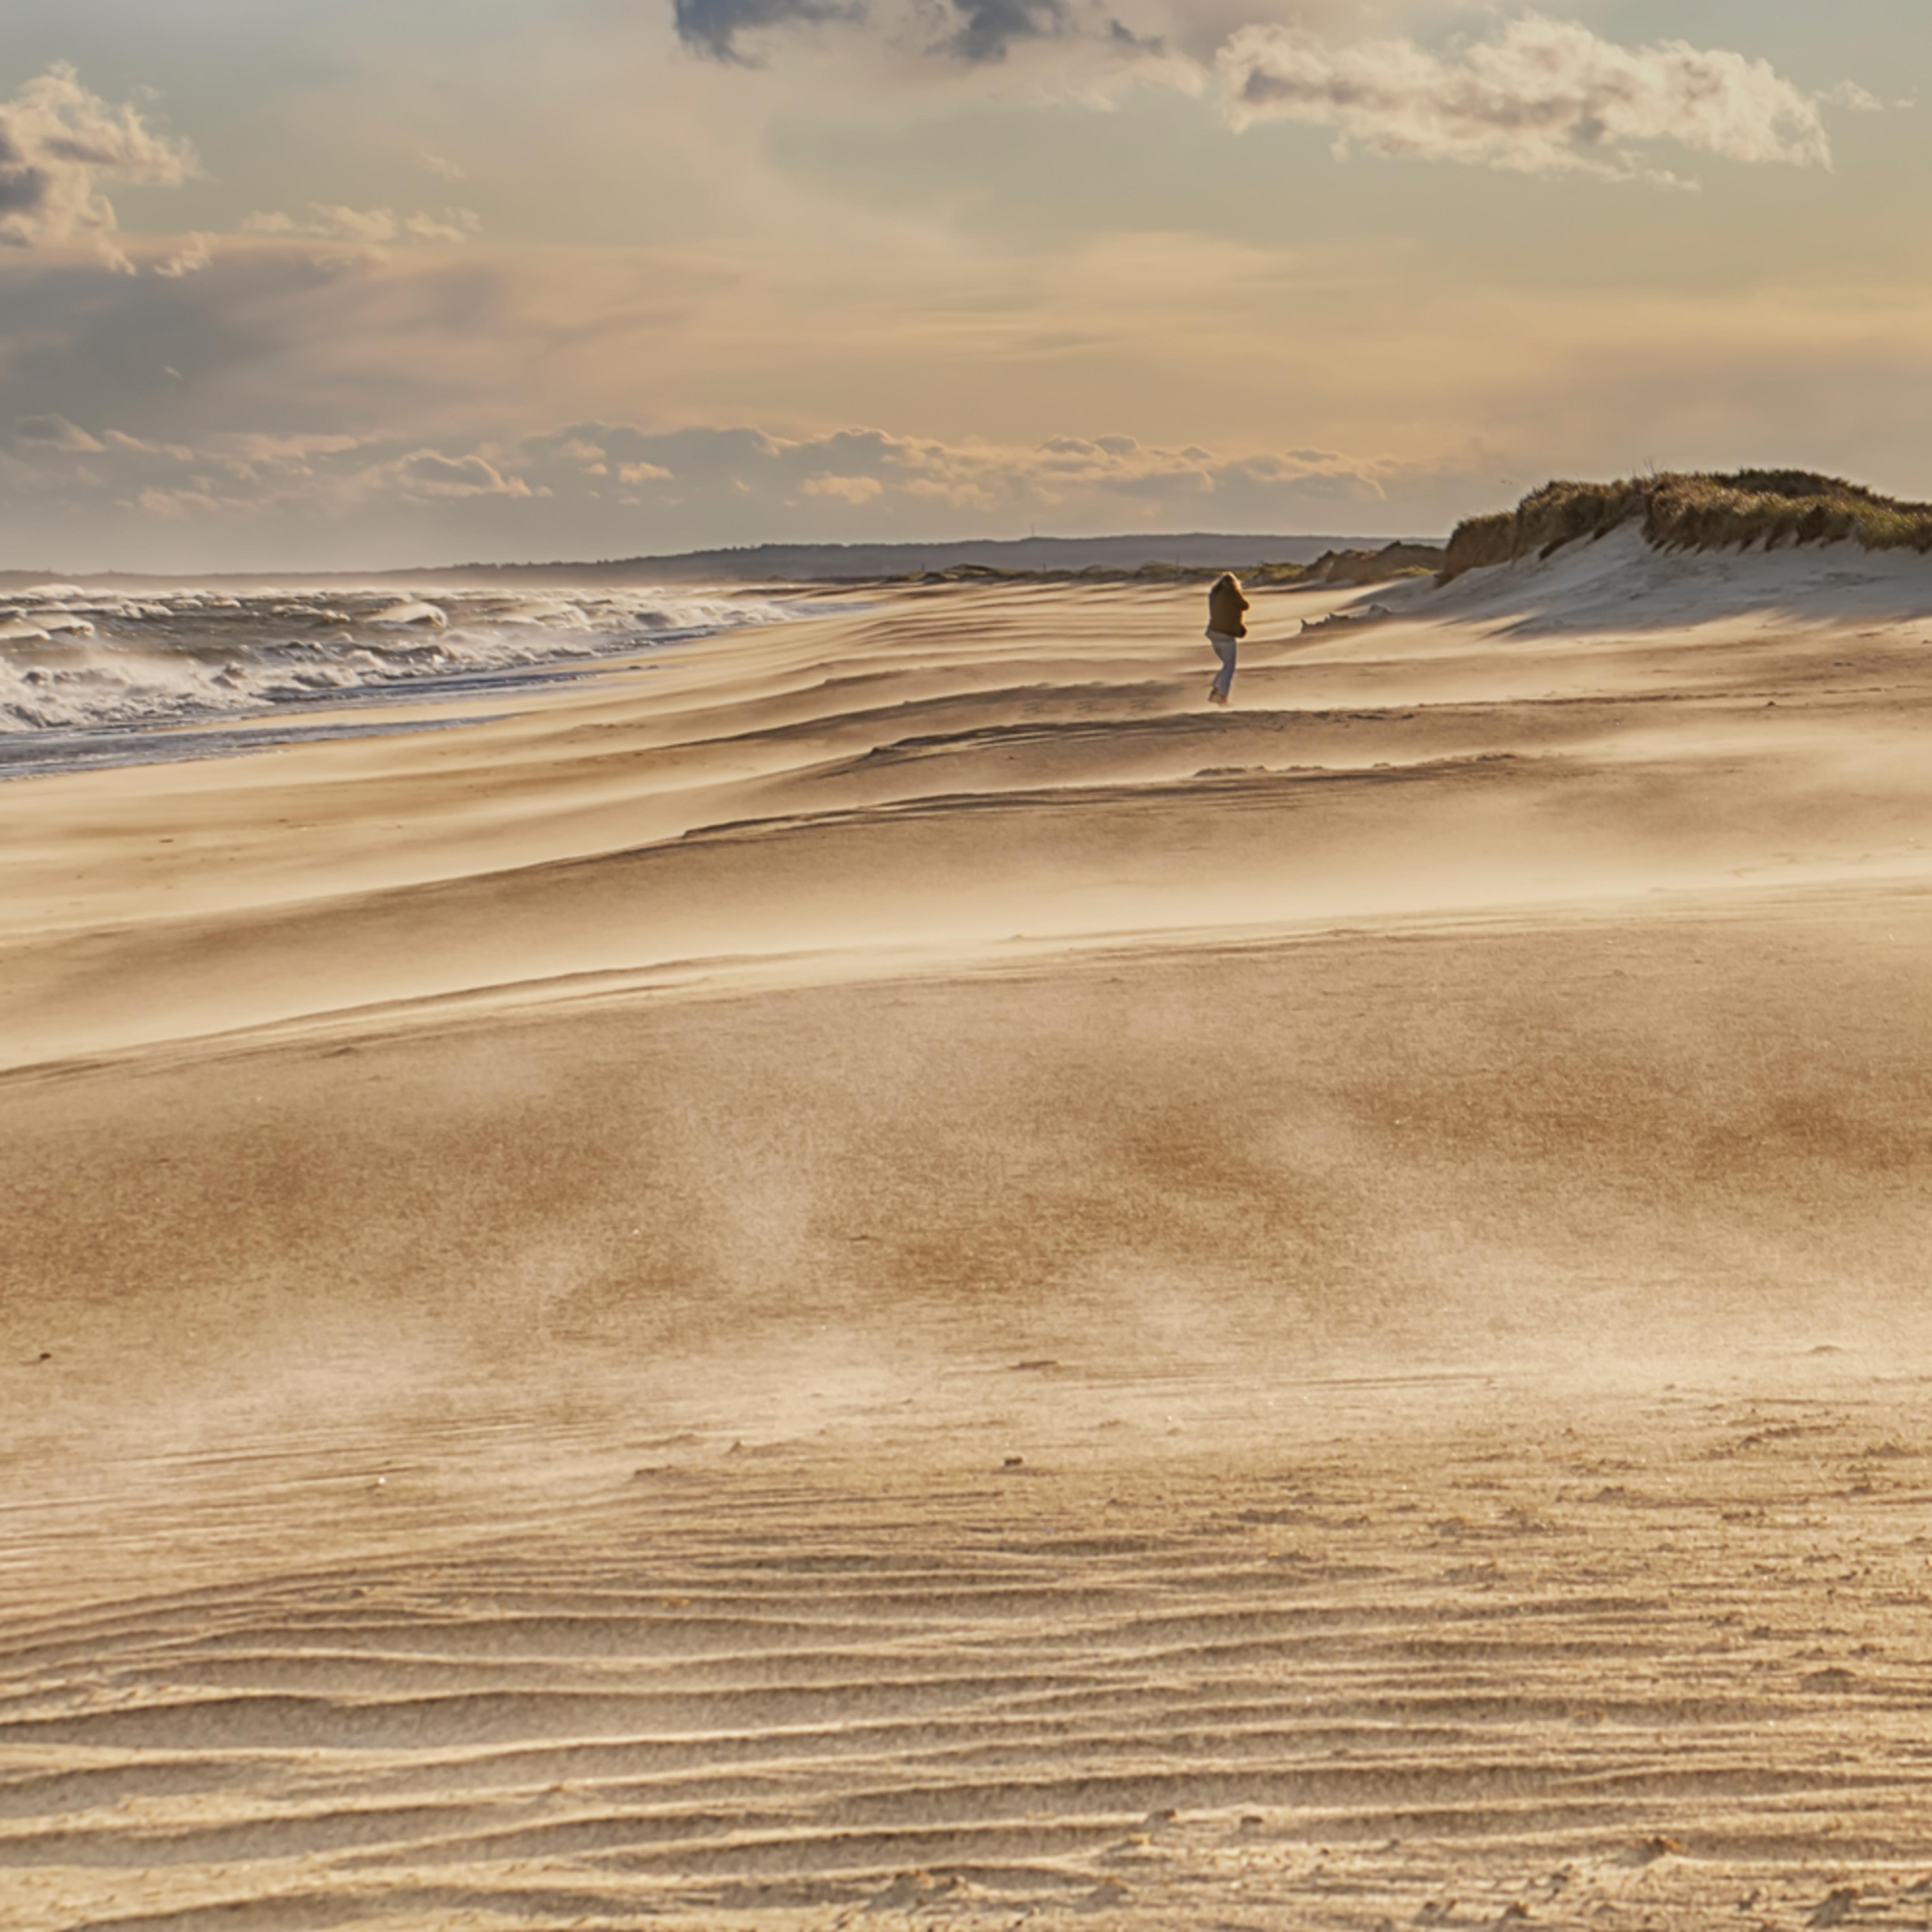 South beach against the wind j0lxqw